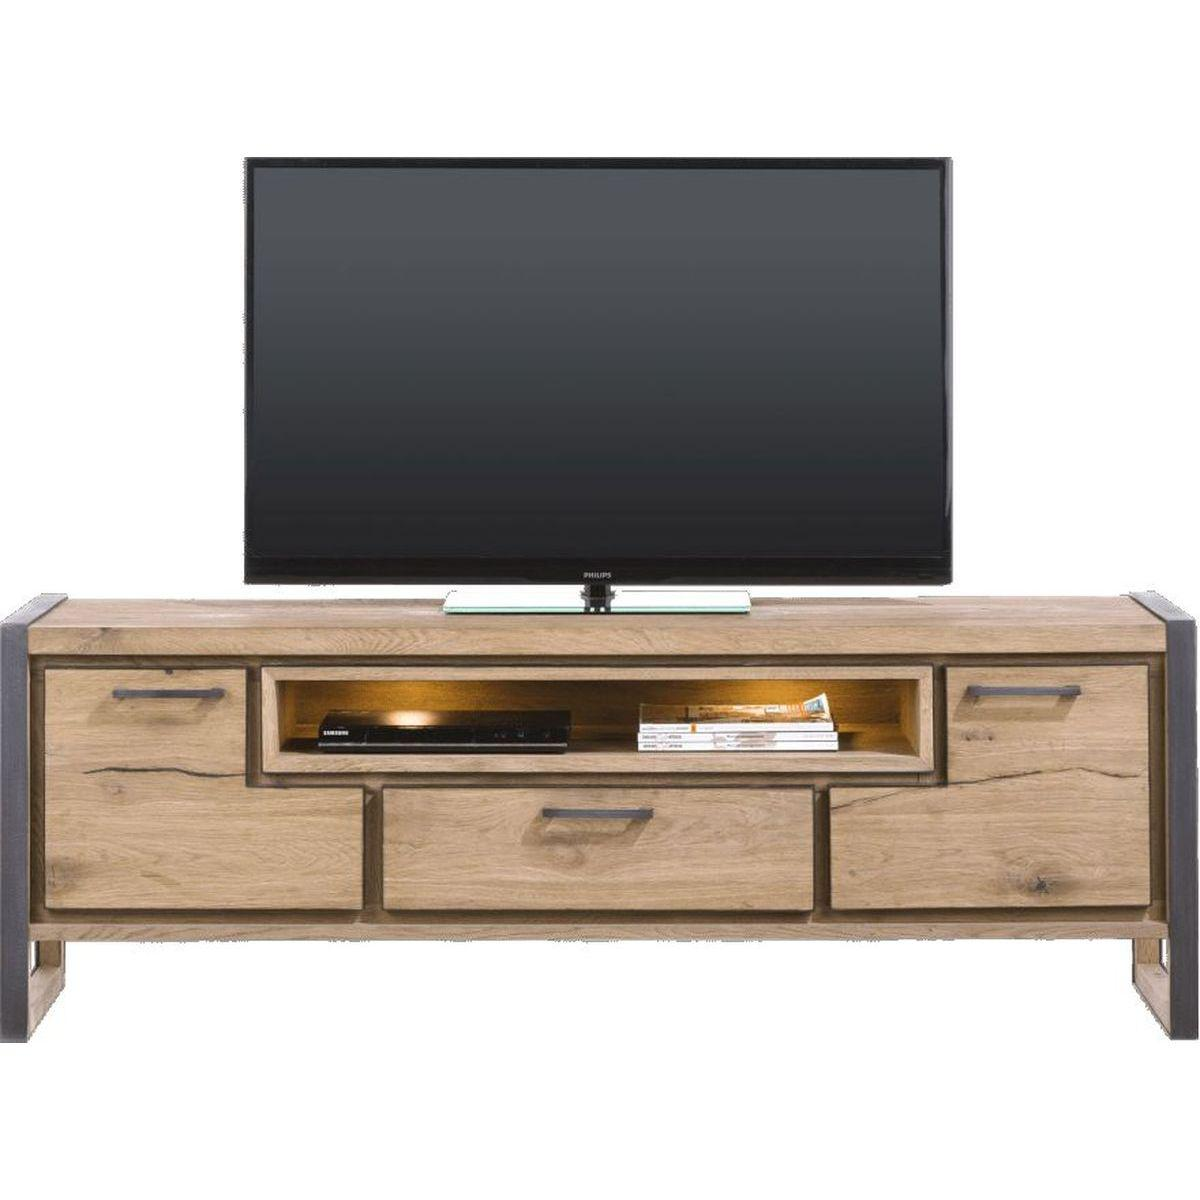 Meuble 170cm TV METALO Henders & Hazel